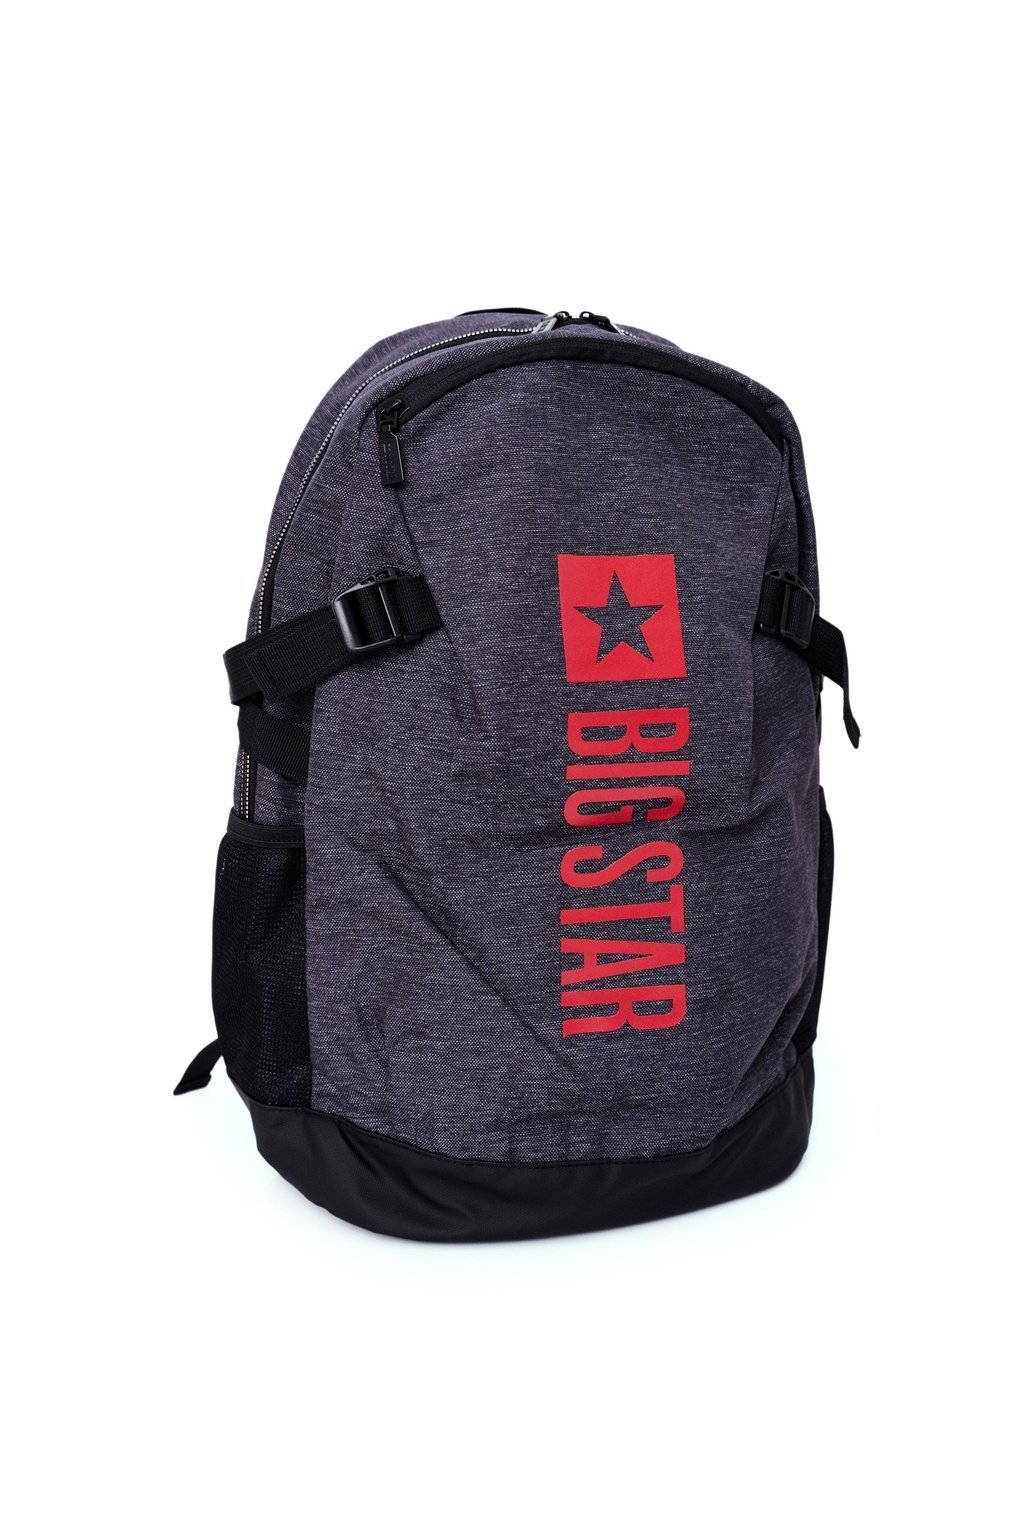 Tmavosivý batoh BS HH574191 DARK GREY